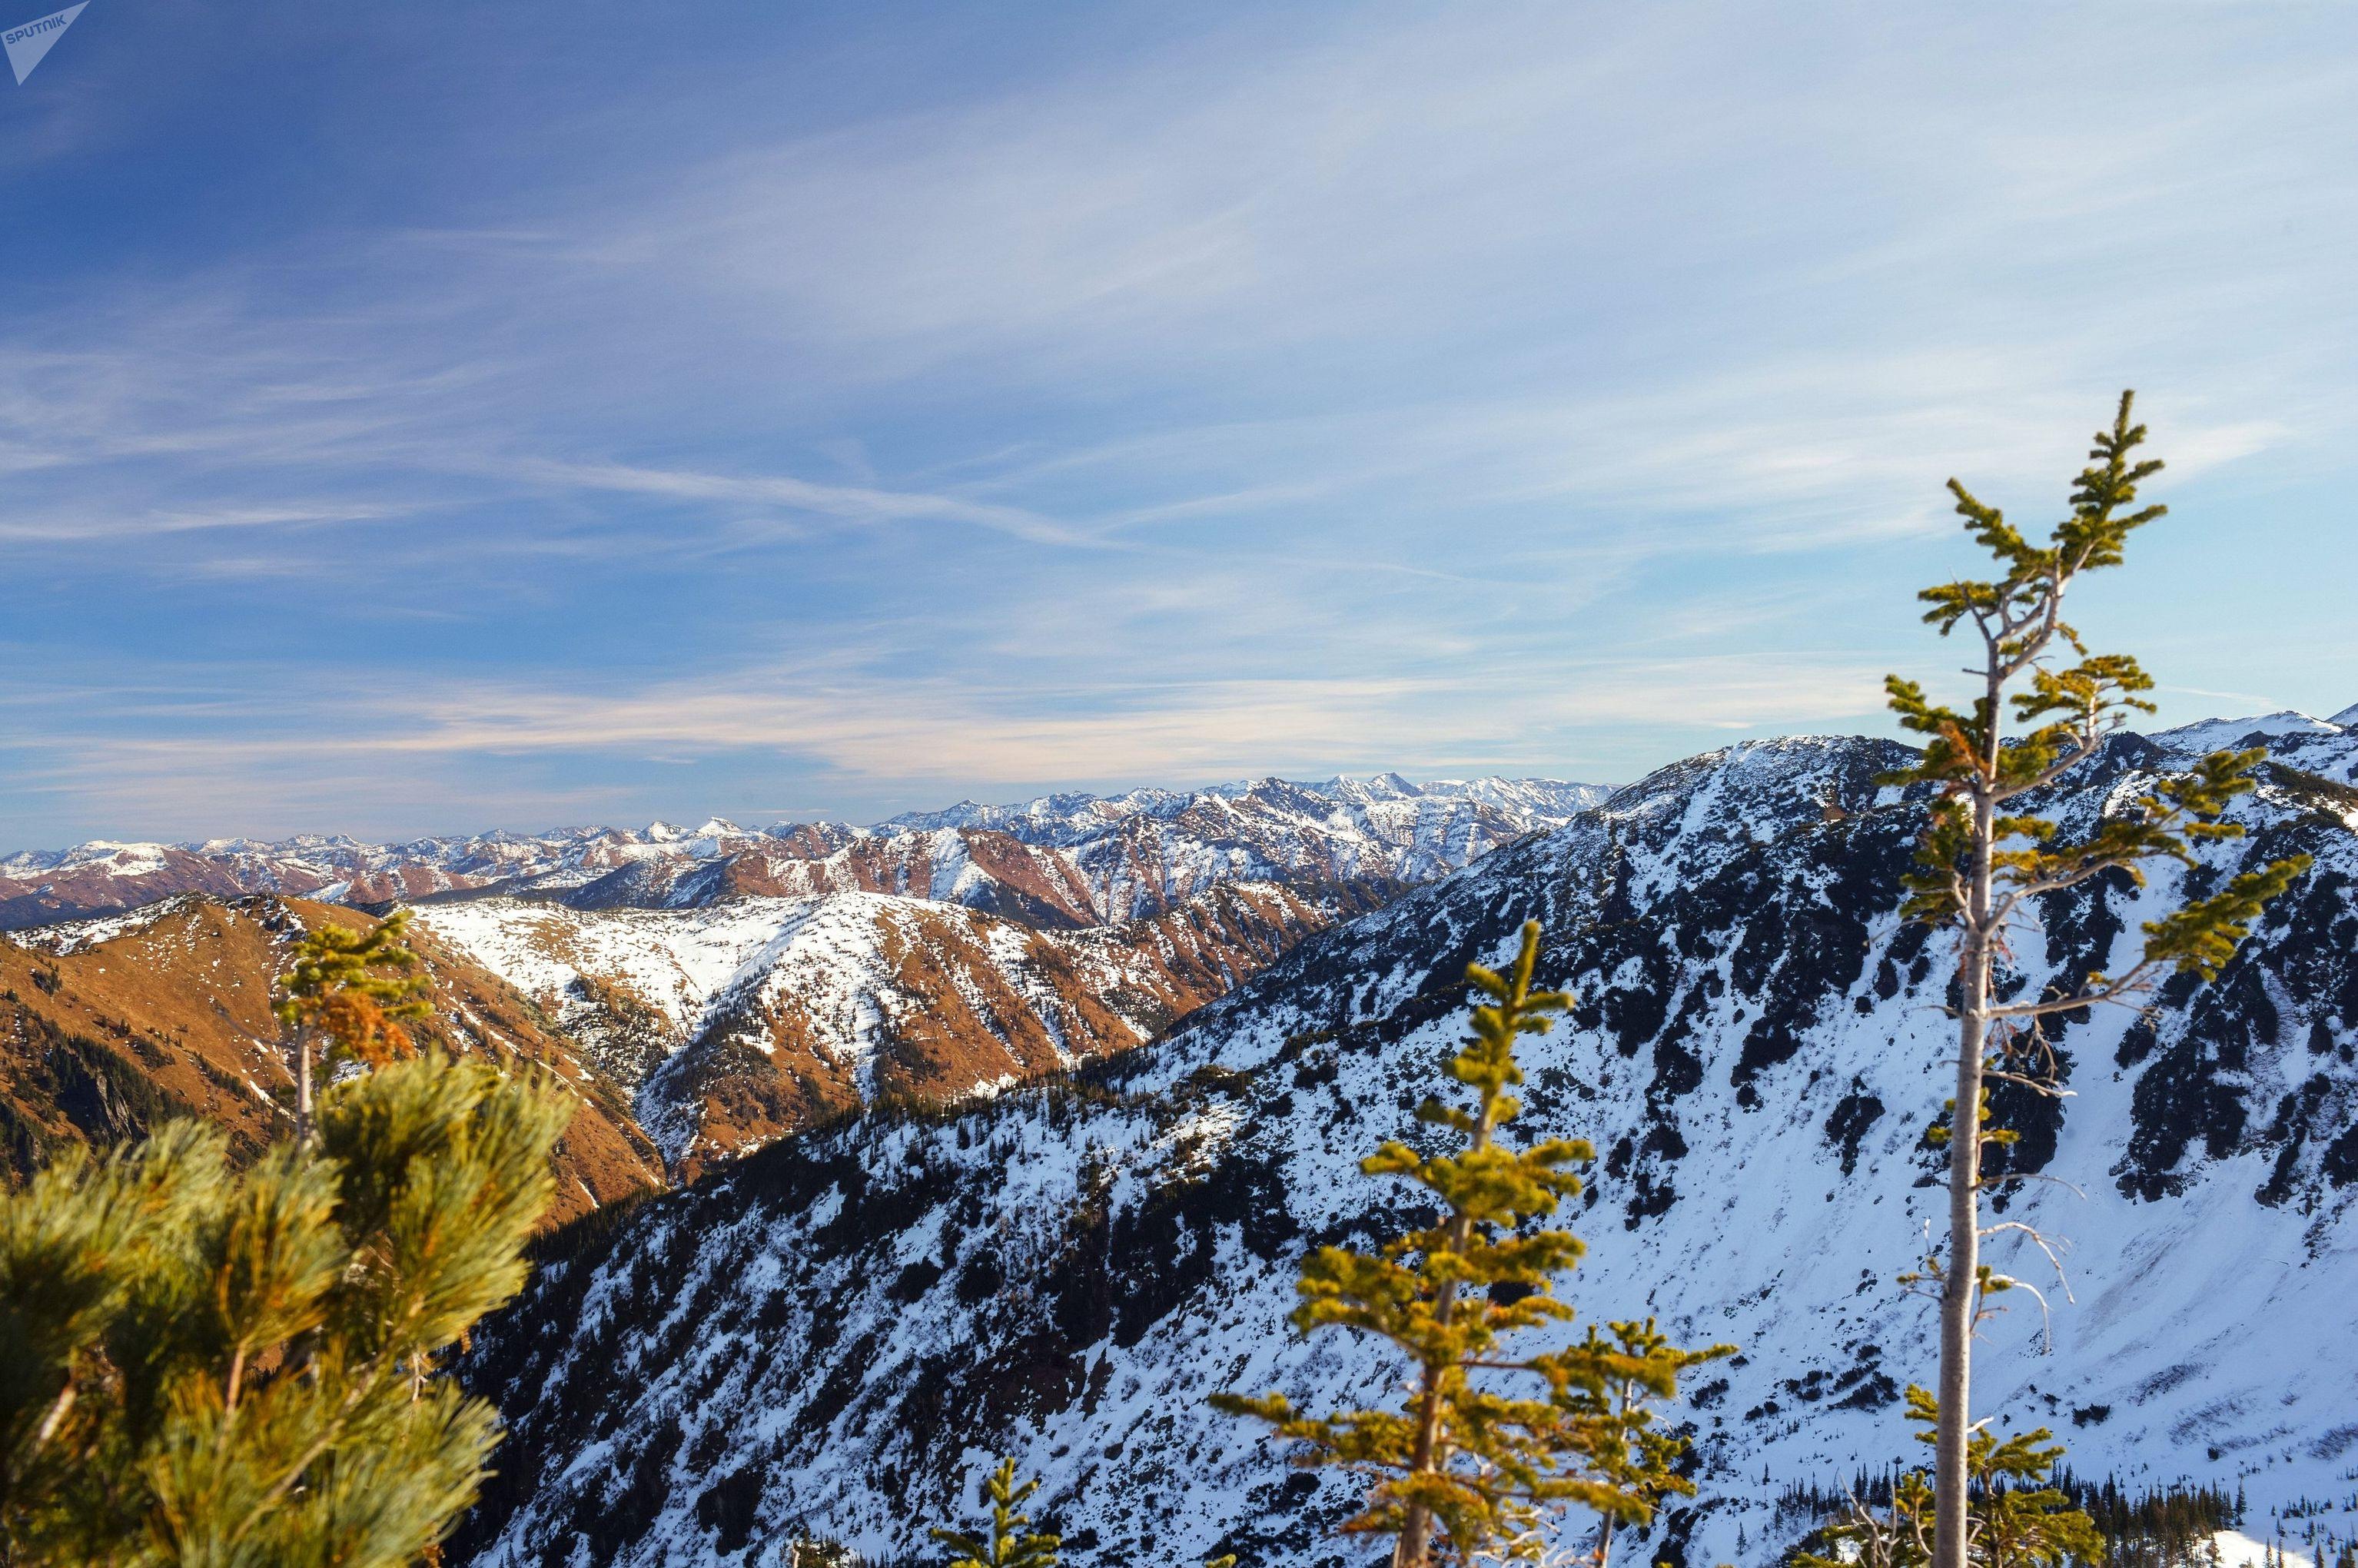 Вид на пики хребта Хамар-Дабан с горы Мамай Истинный